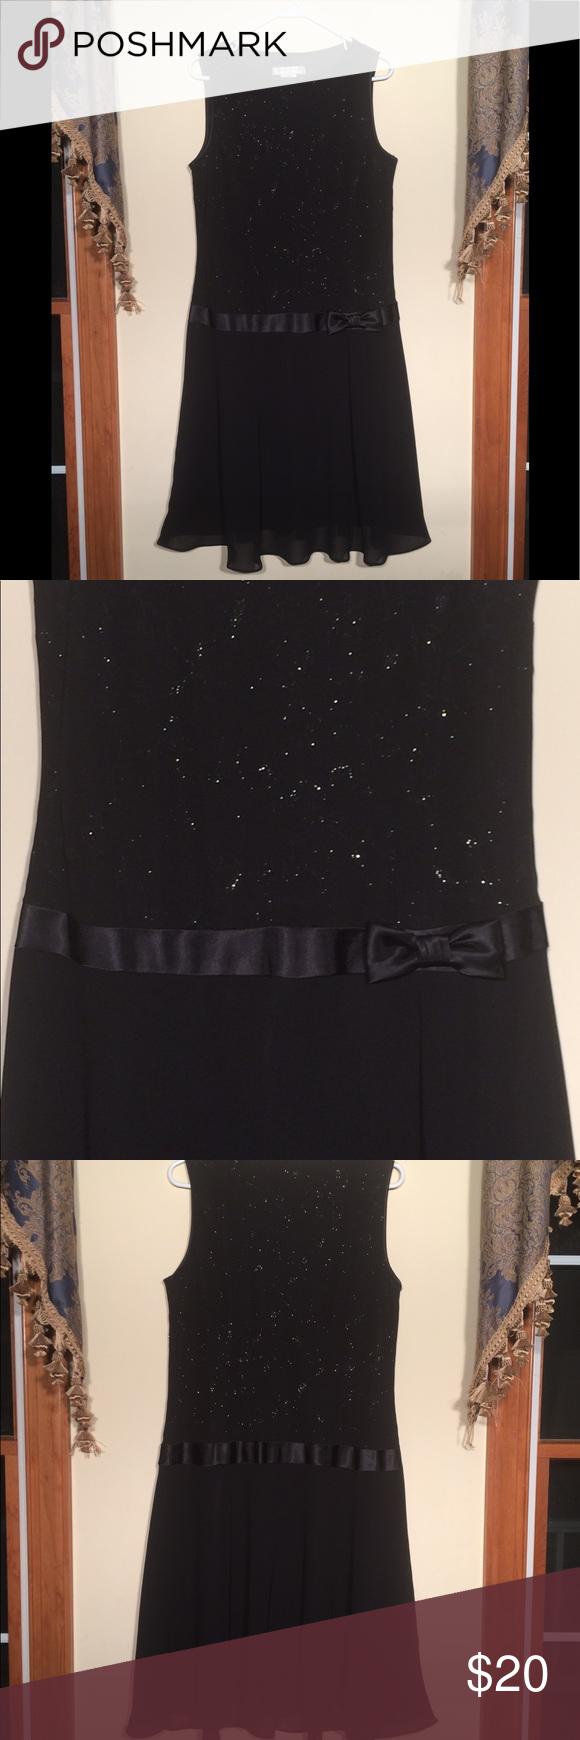 Evan Picone Black Dress 16 Stylish Dresses Clothes Design Size 16 Dresses [ 1740 x 580 Pixel ]